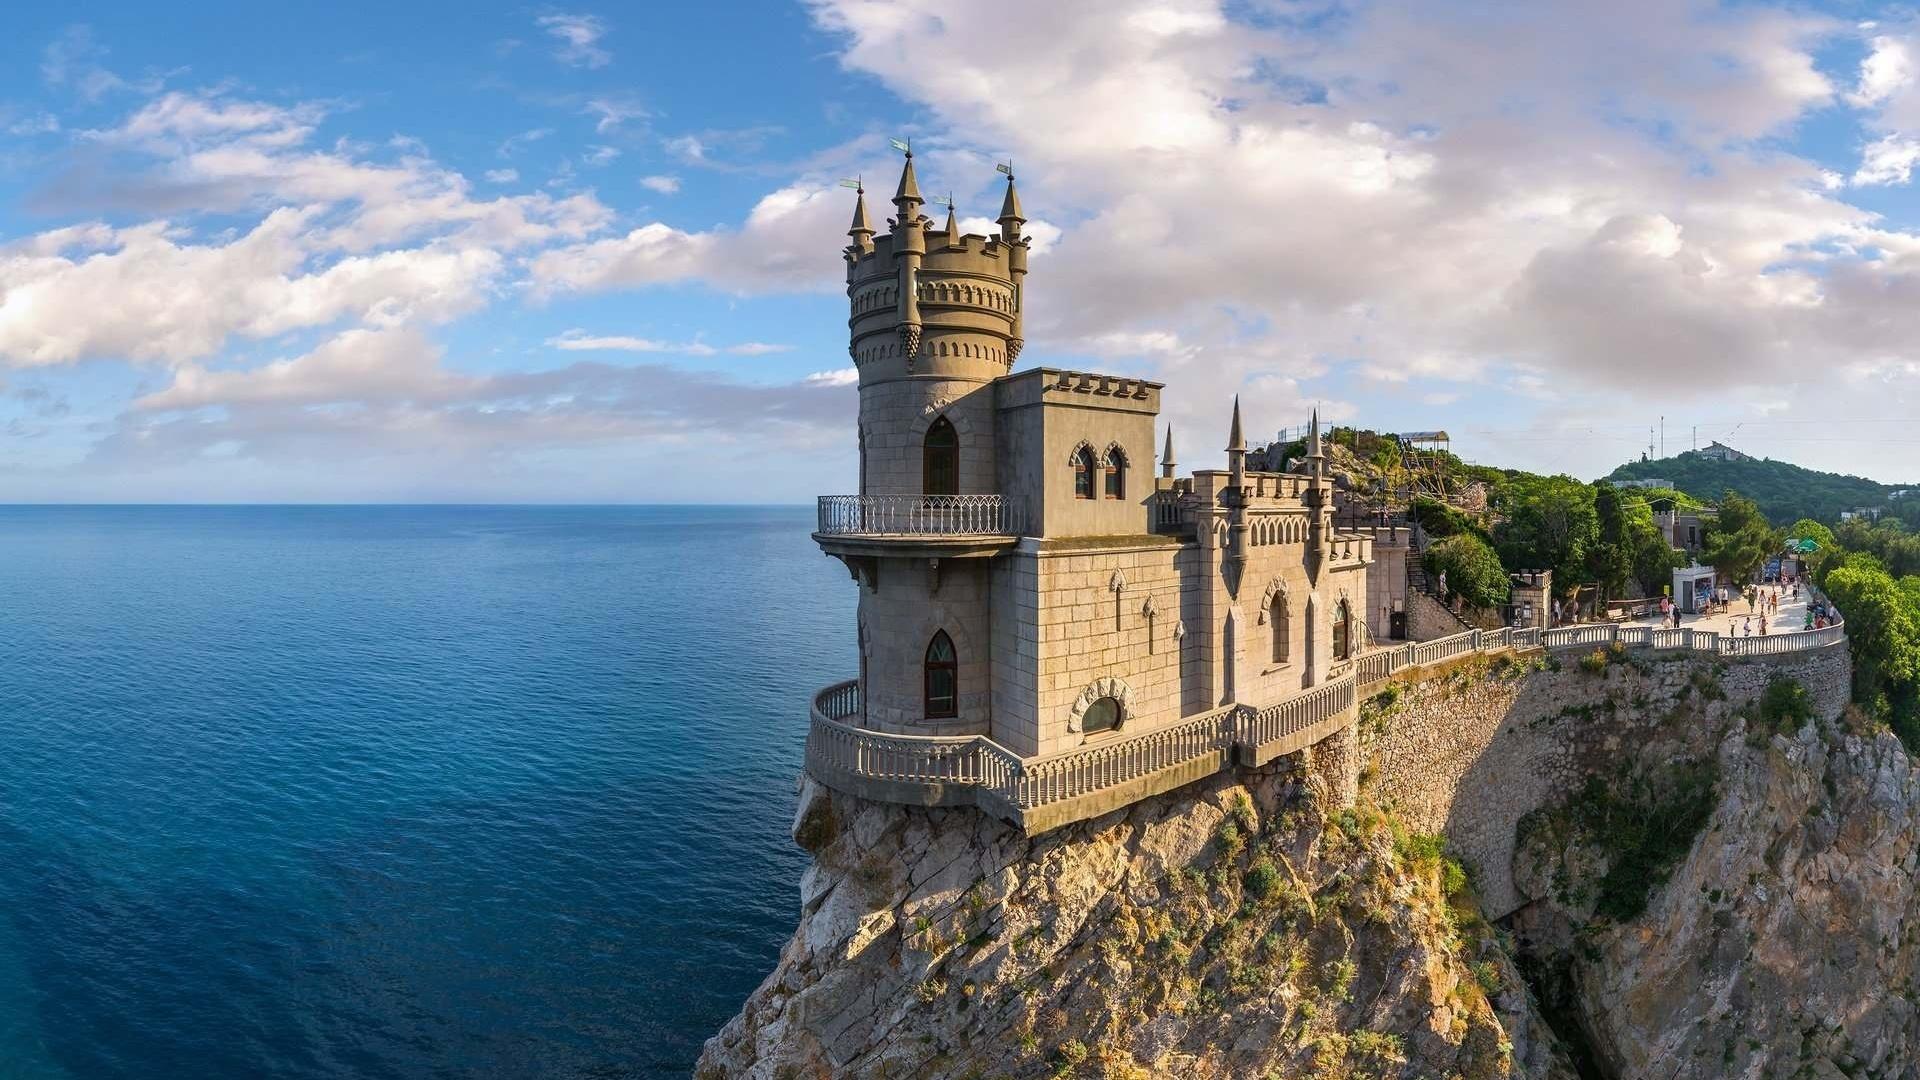 Весь Крым ( Феодосия, Судак, Алушта, Ялта)